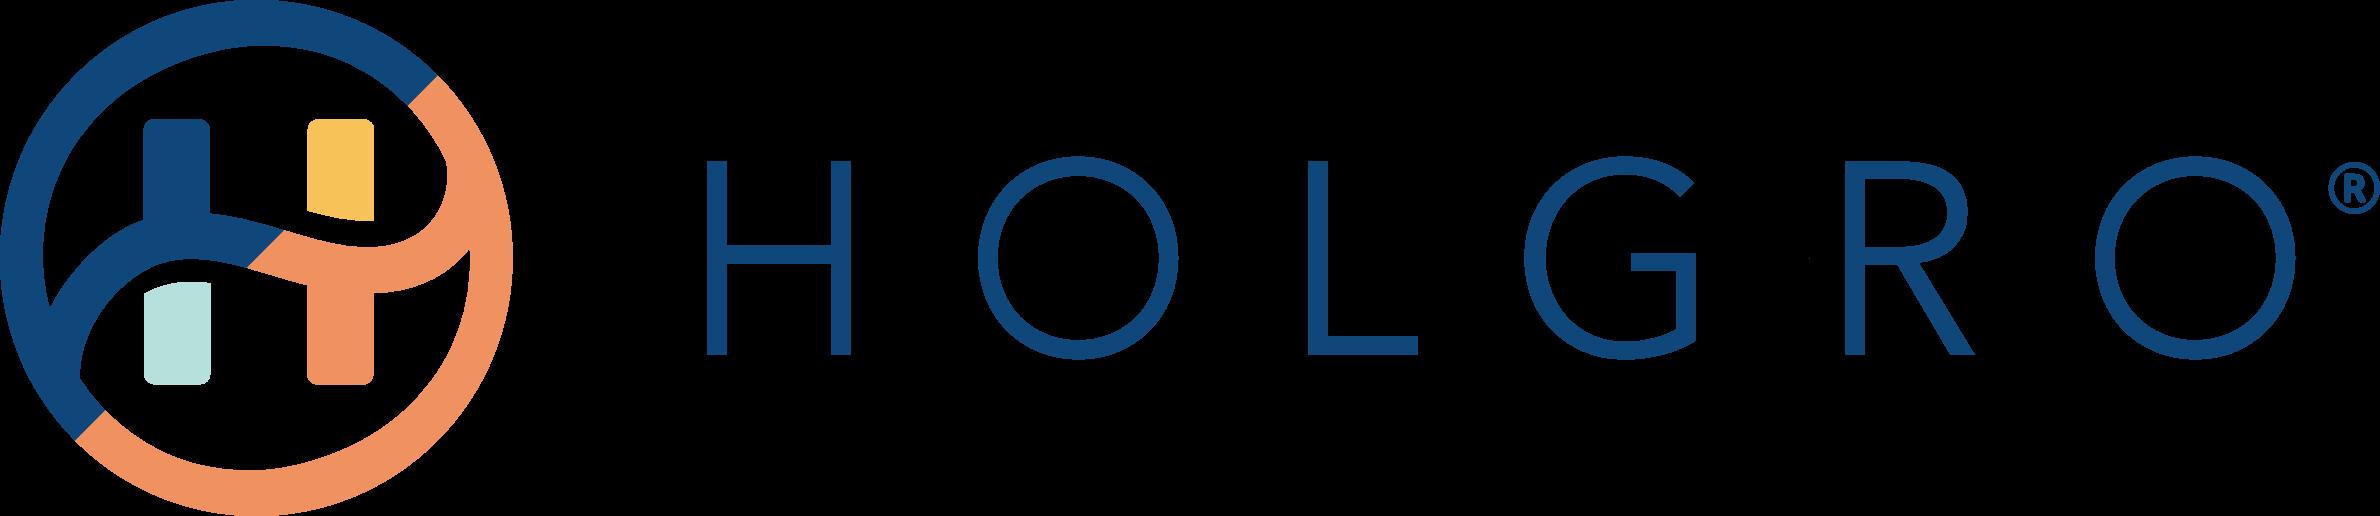 holgro logo